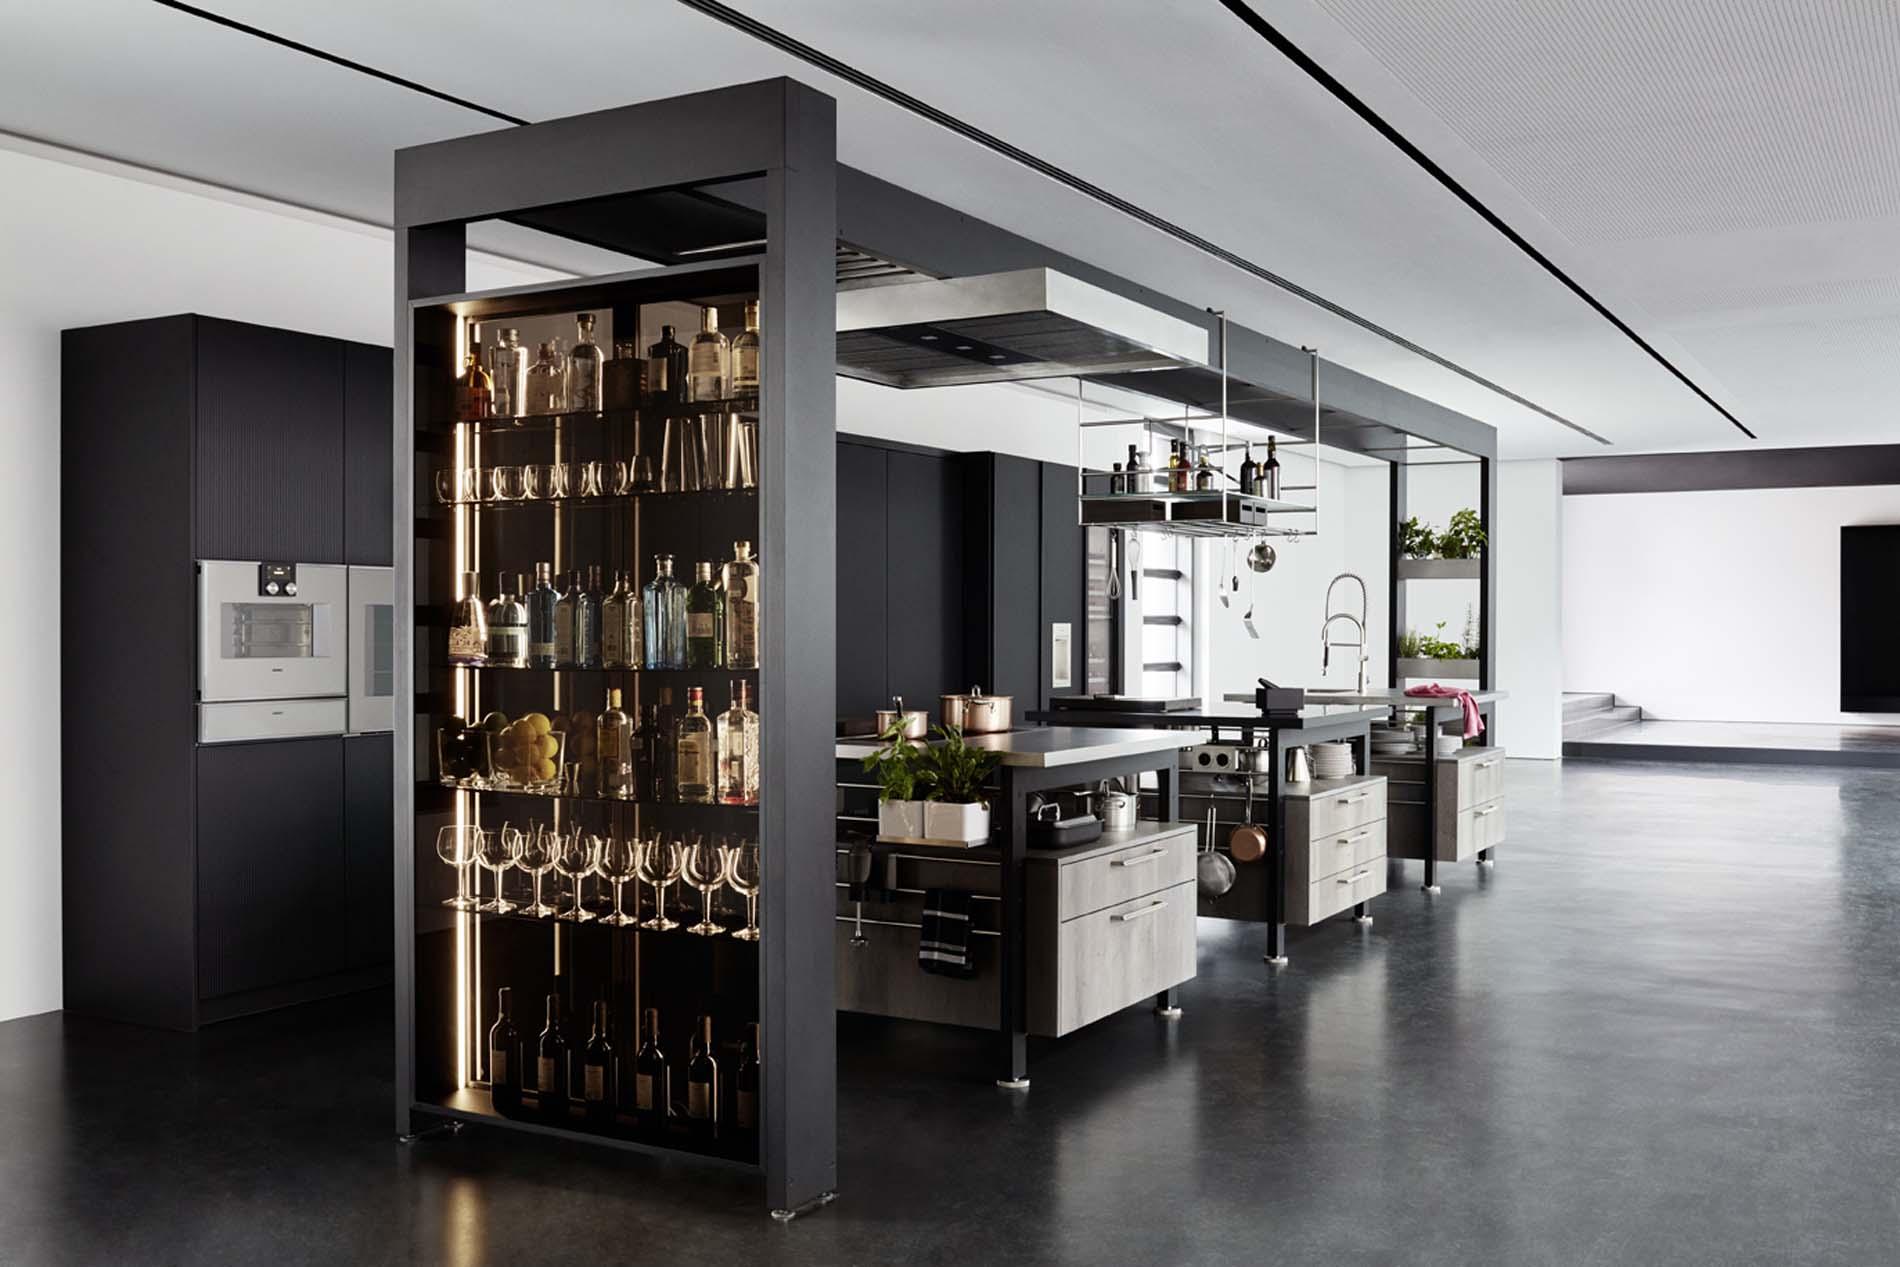 Klein Keuken Industriele : Industriële keukens nieuwe keuken kopen aswa keukens